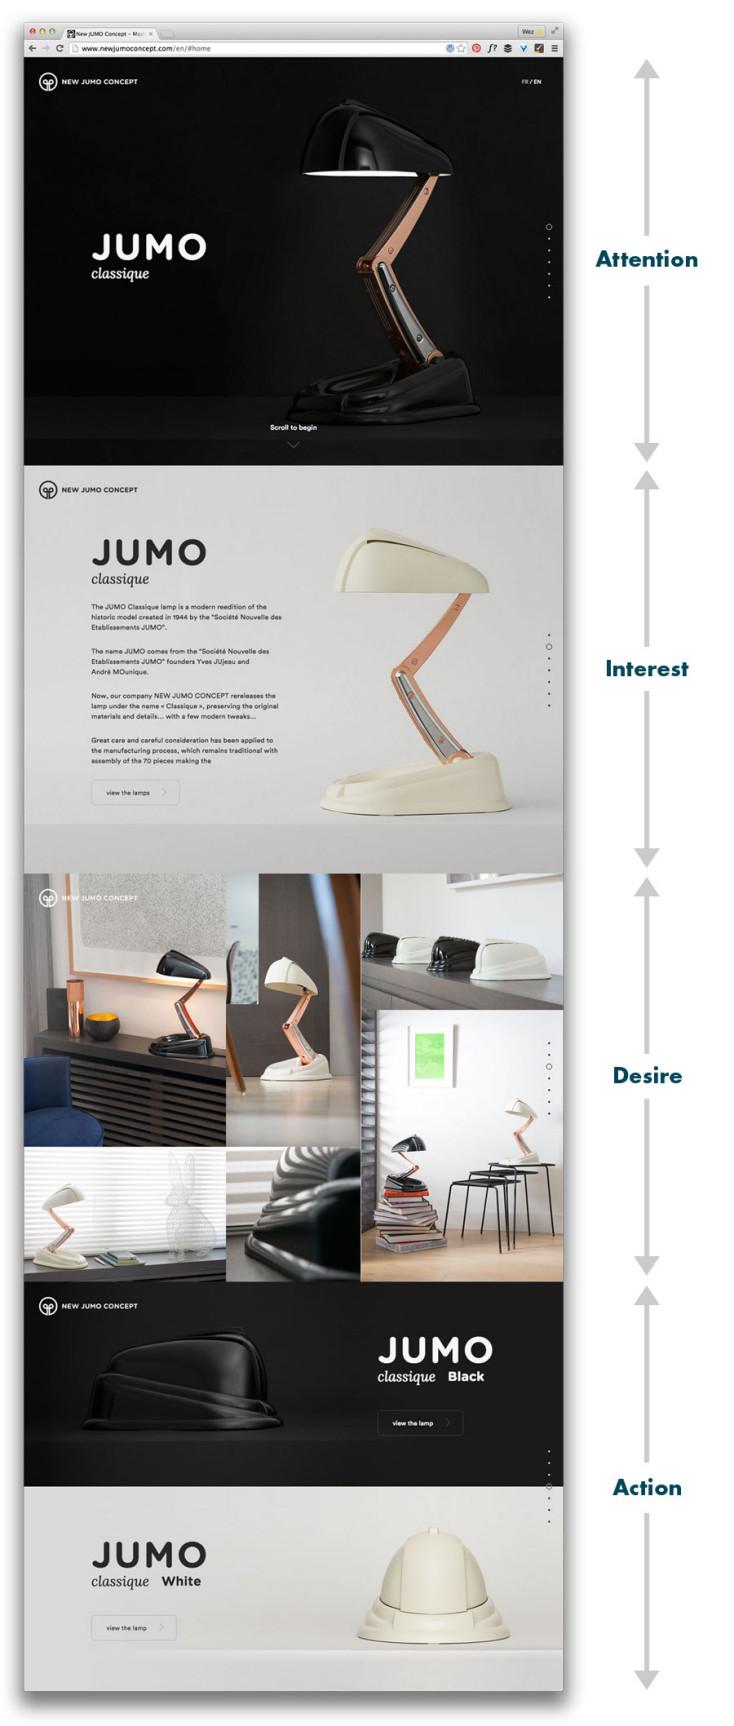 Jumo home page